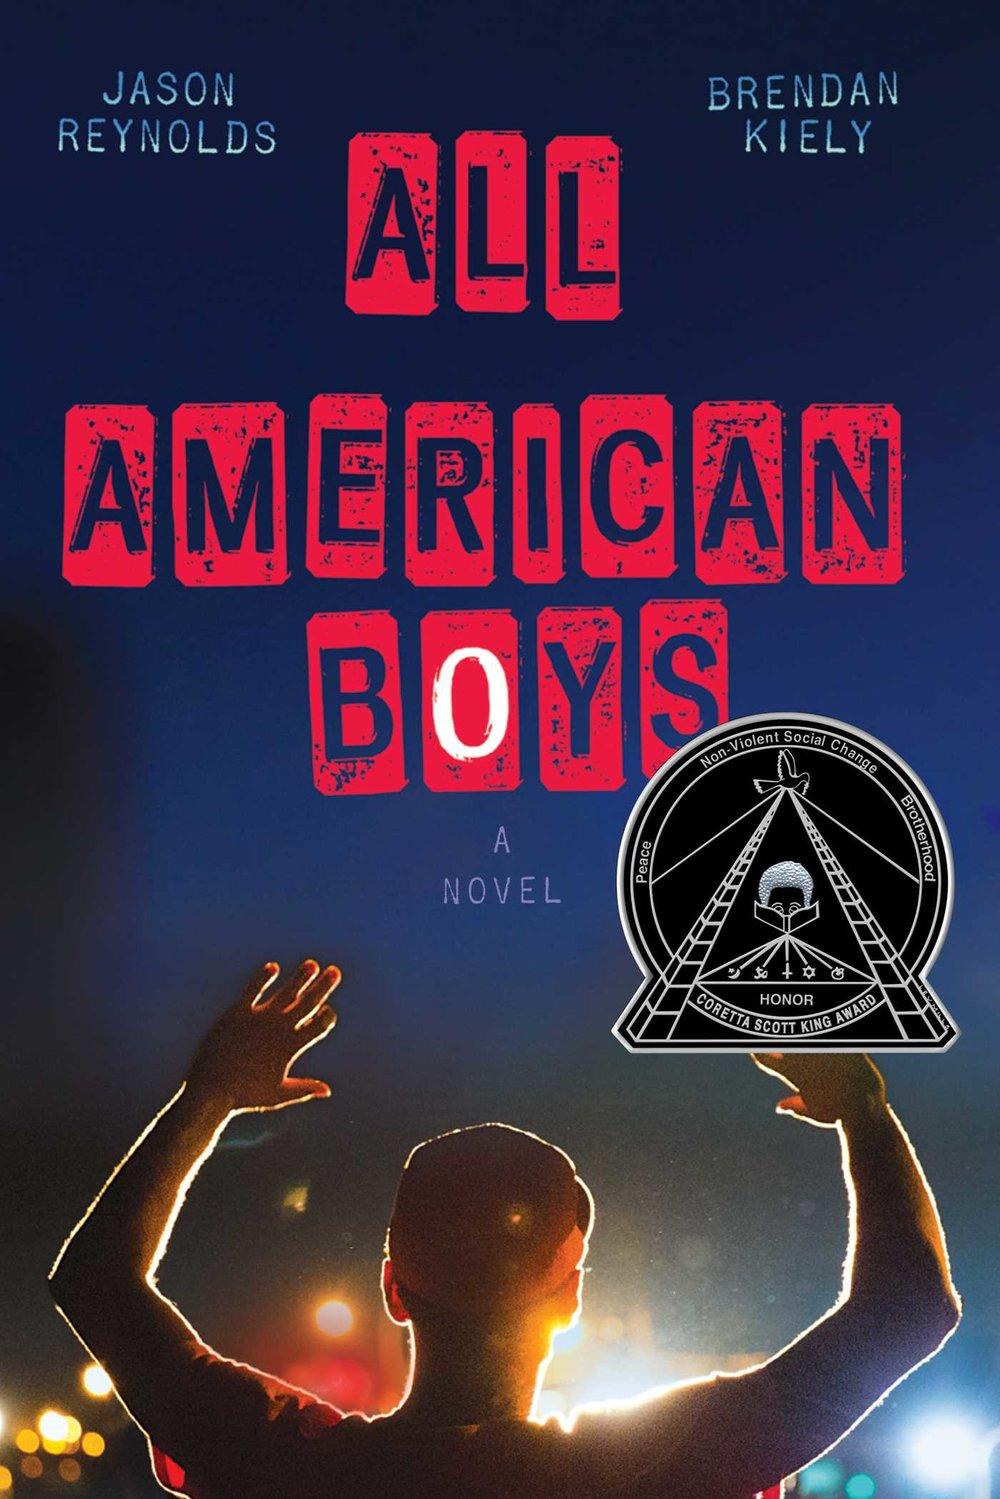 brendan-kiely-all-american-boys.jpg